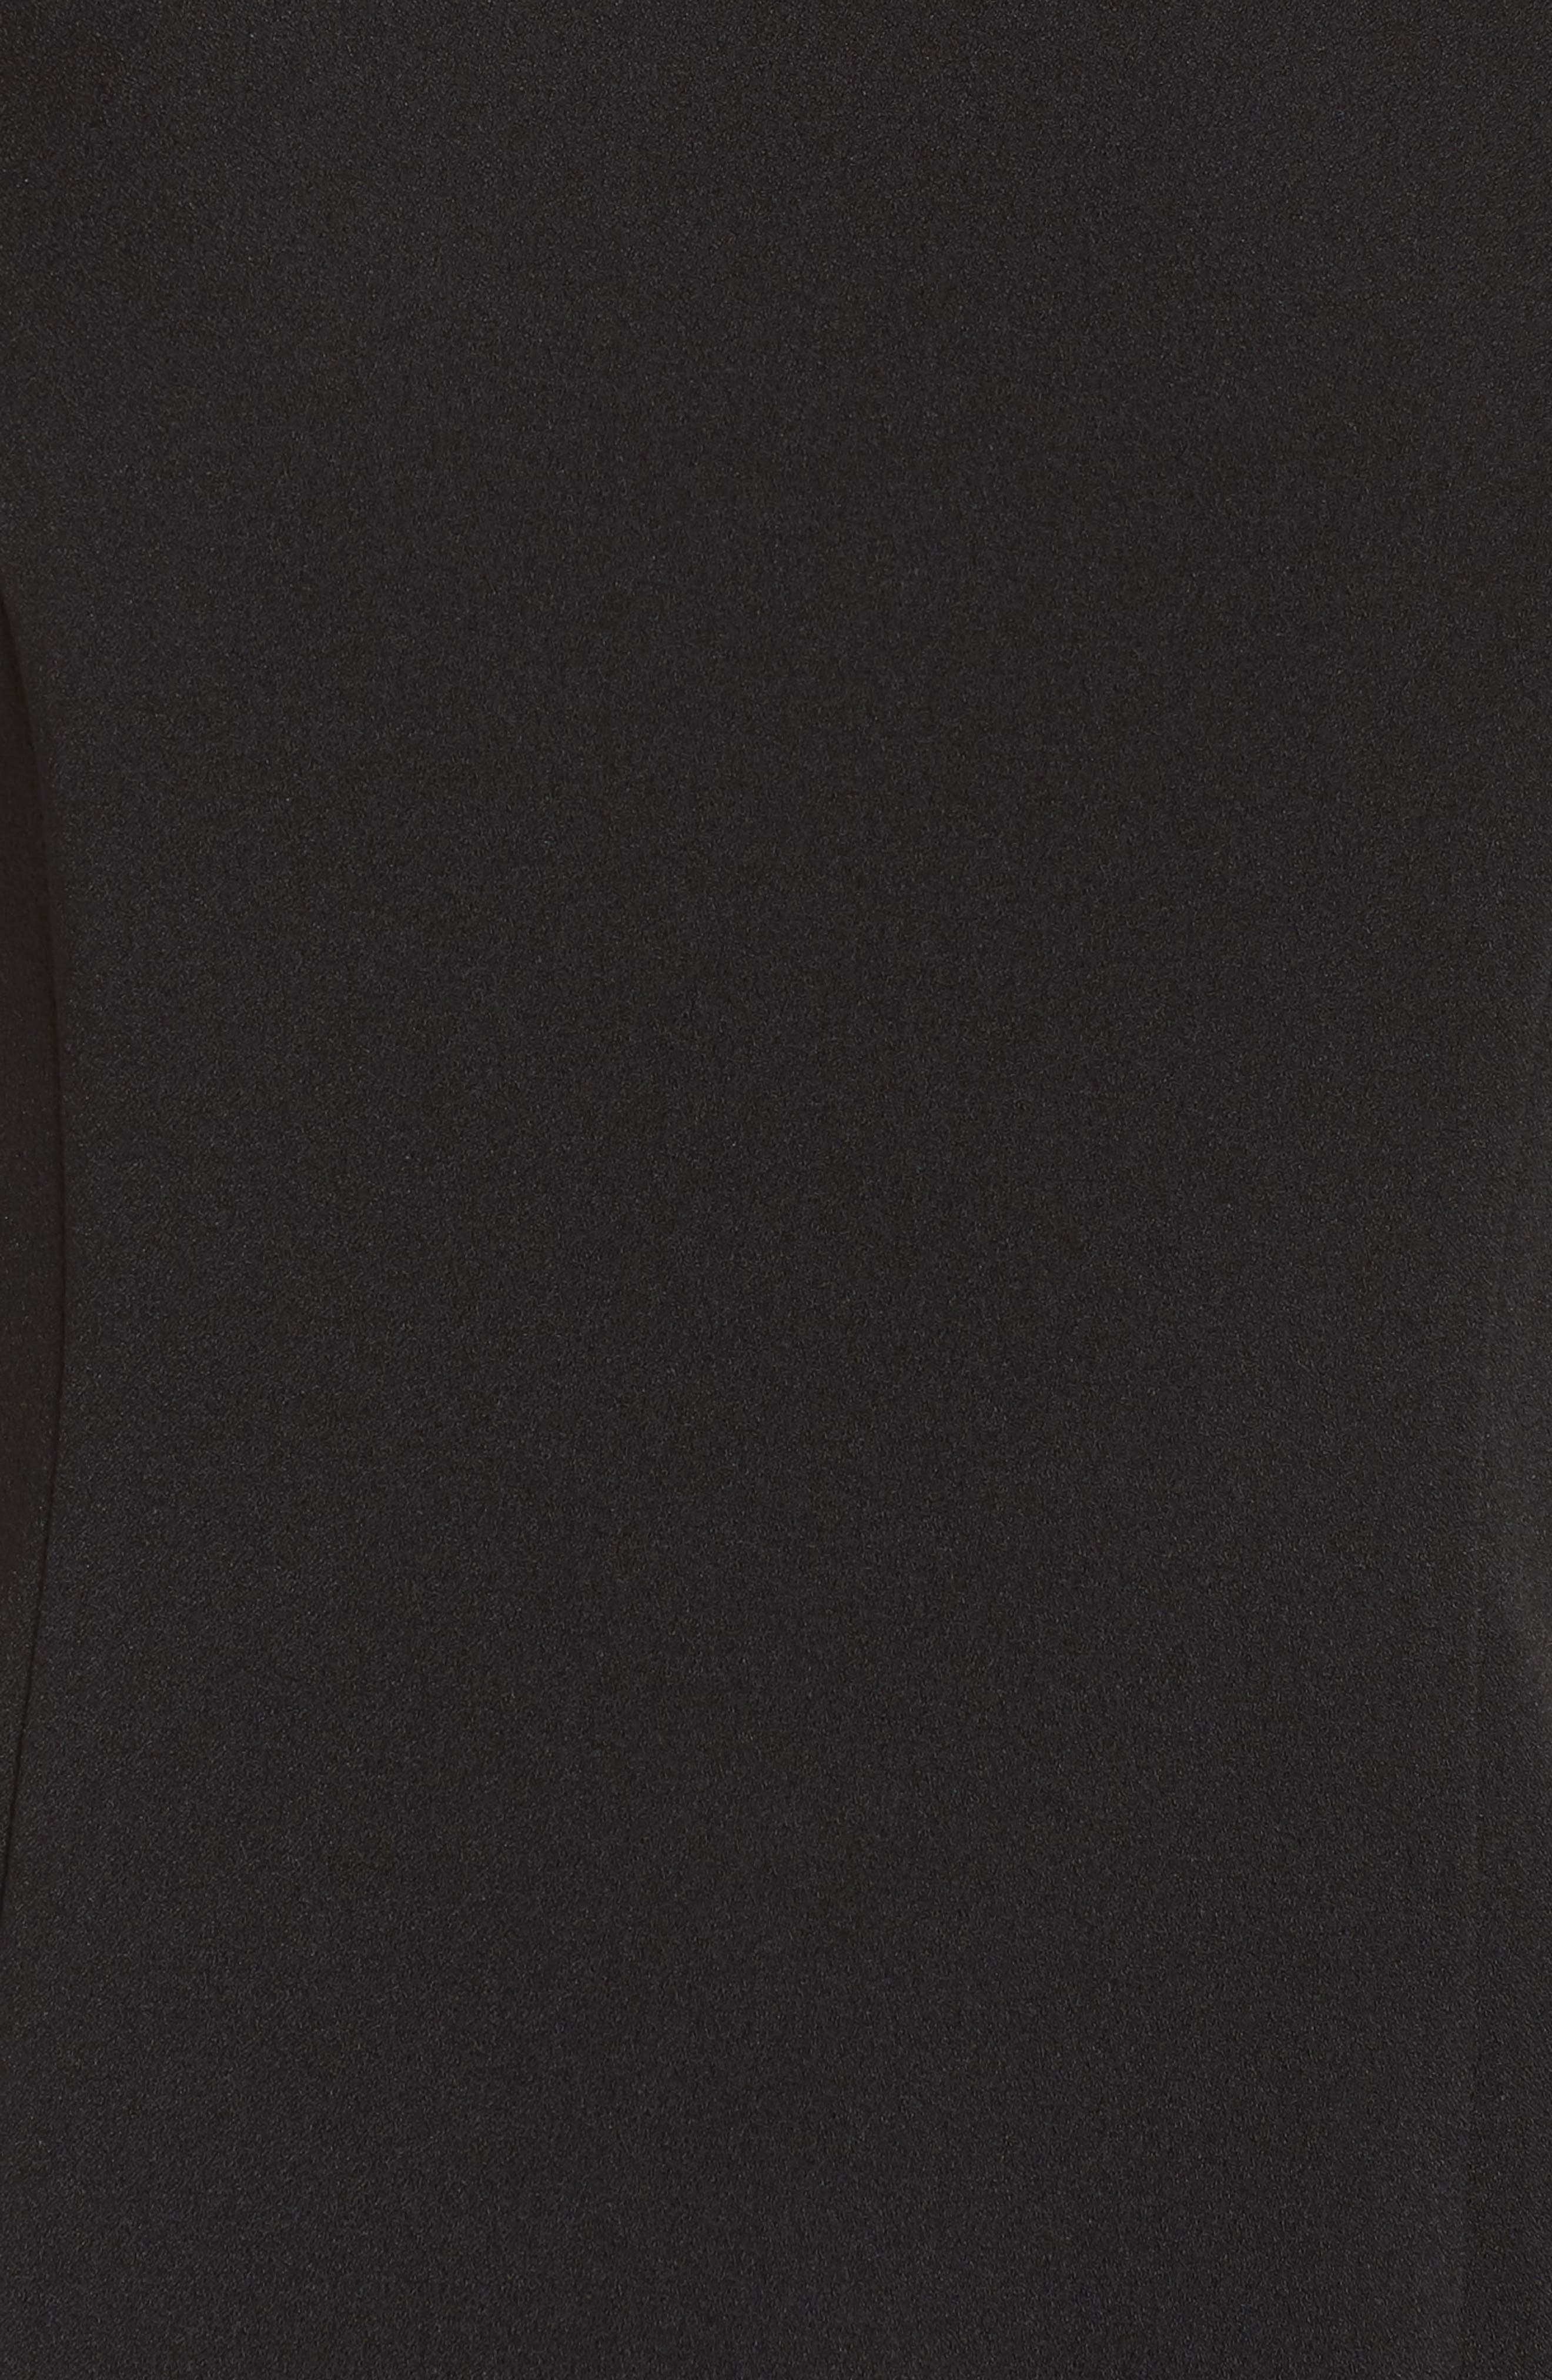 Feather Hem Sheath Dress,                             Alternate thumbnail 6, color,                             BLACK